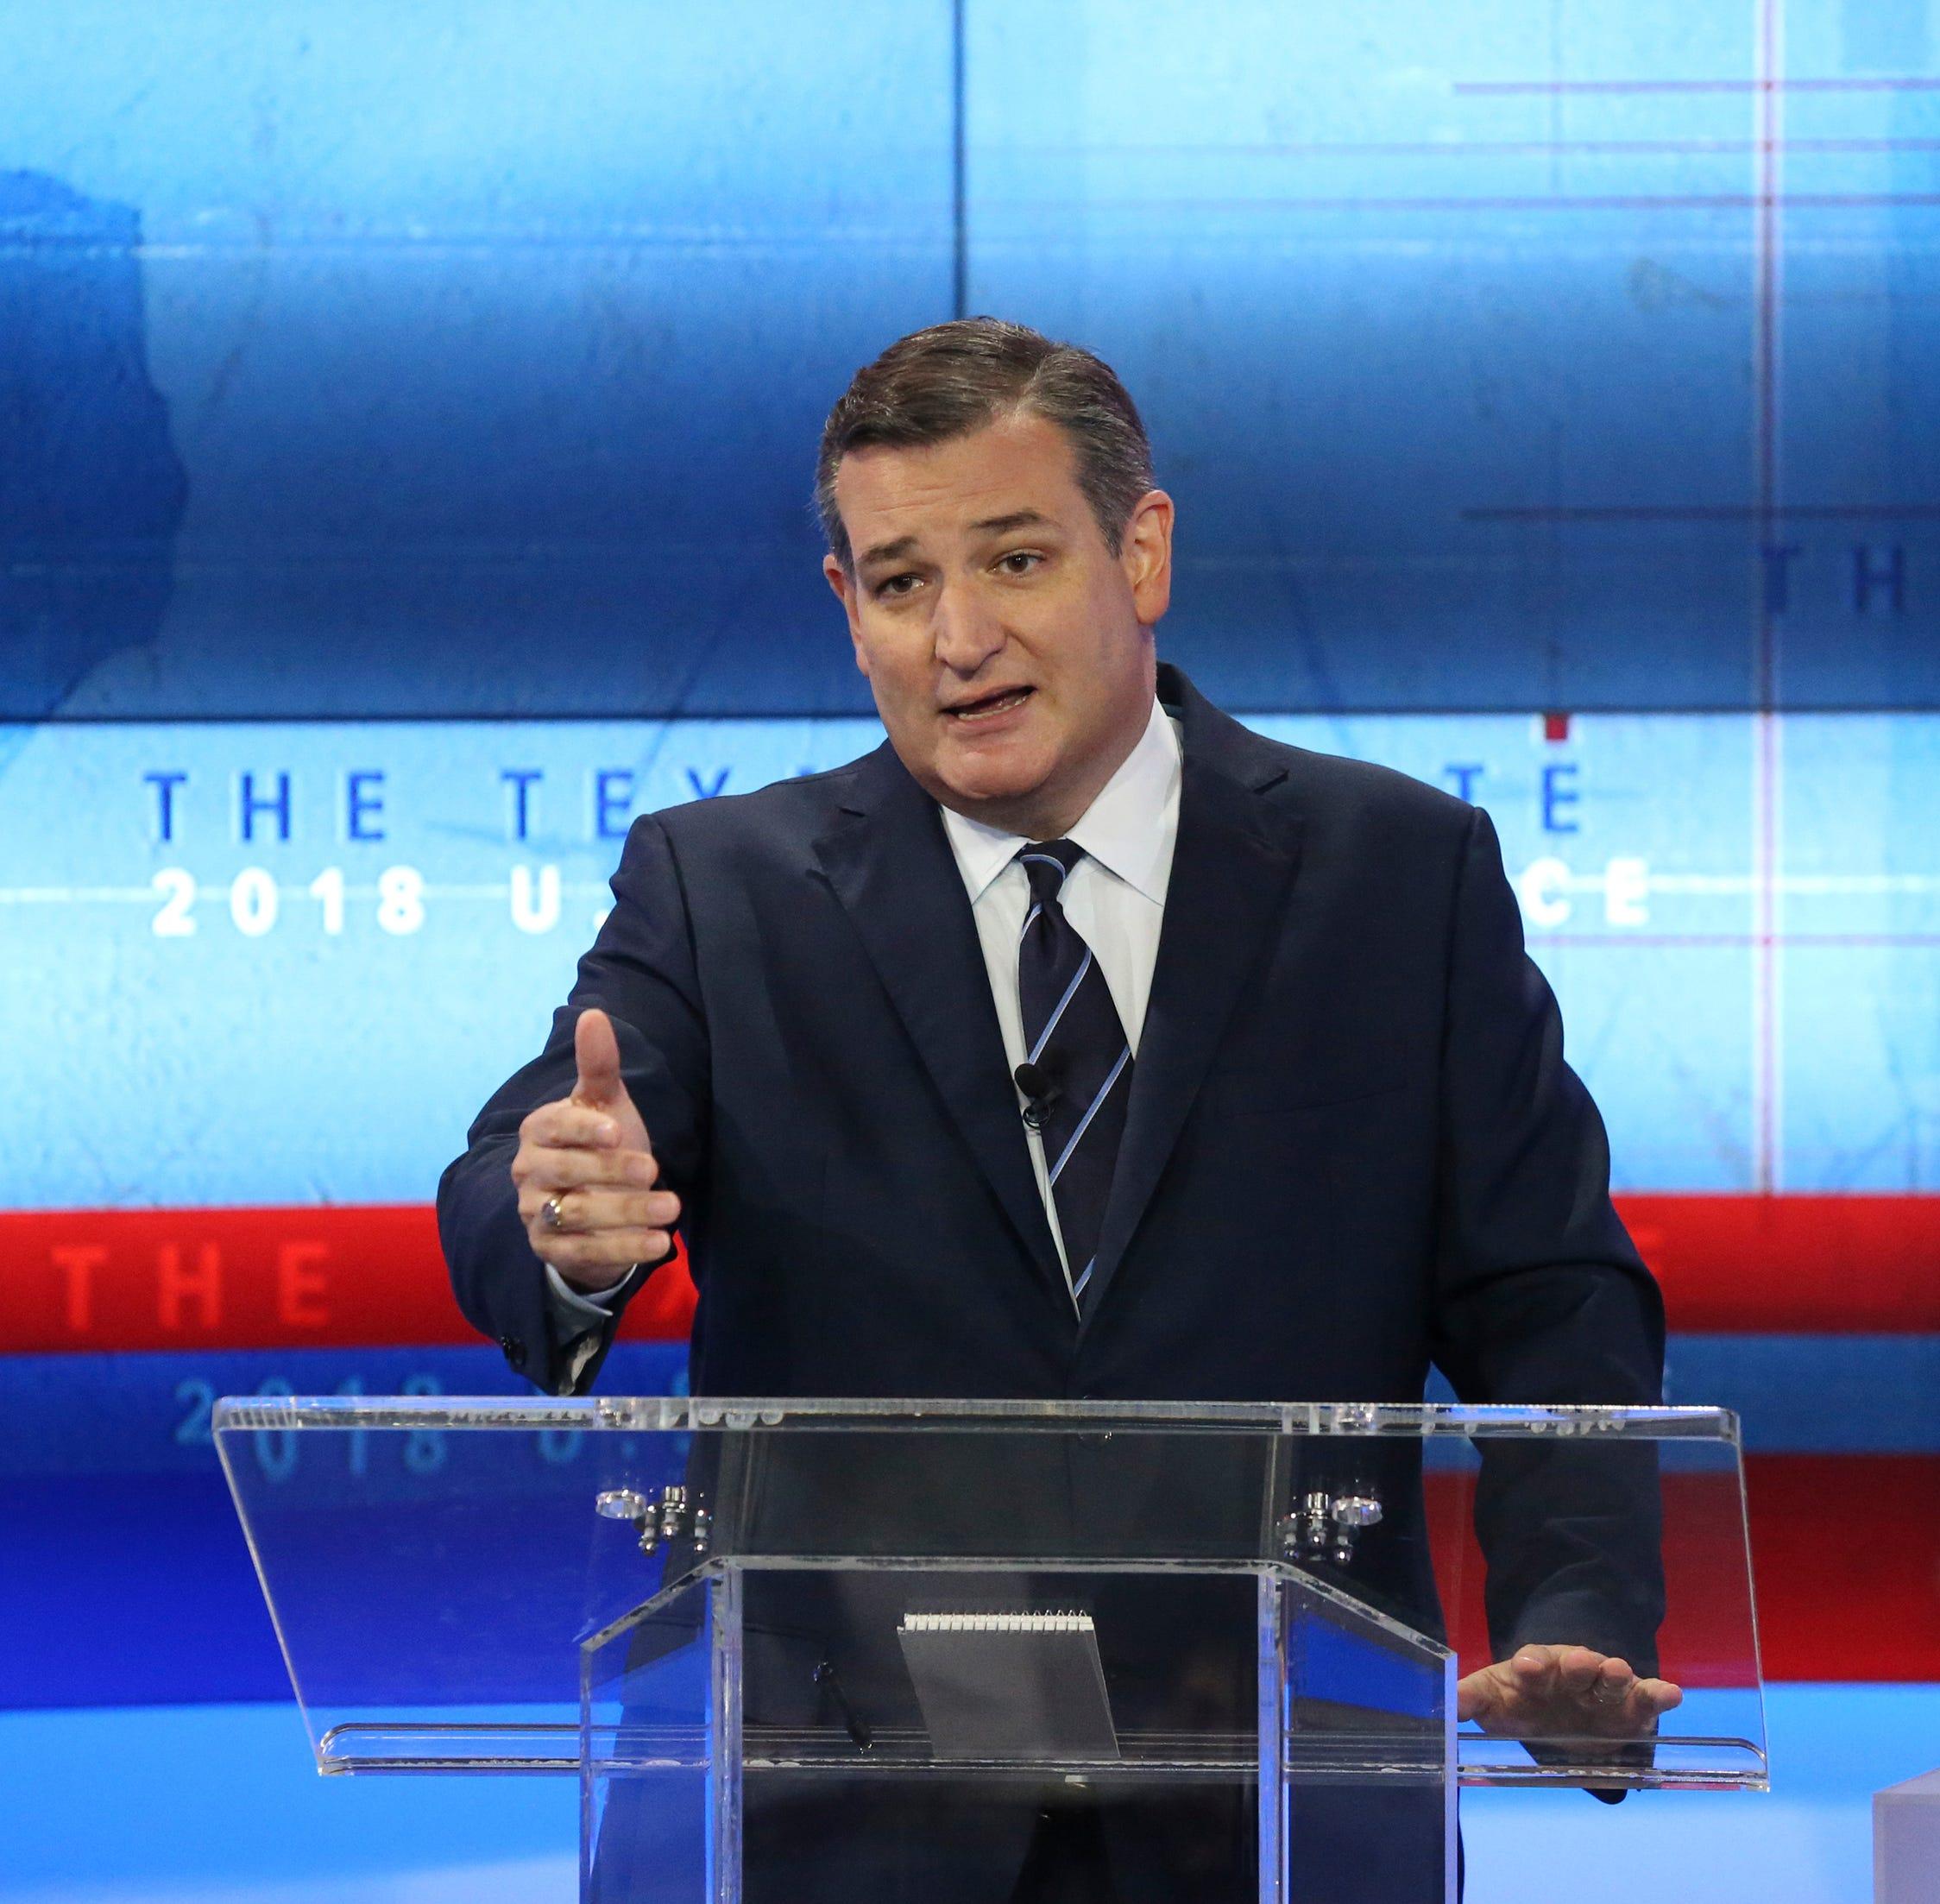 Ted Cruz says National Guard could stop migrant caravan at U.S.-Mexico border